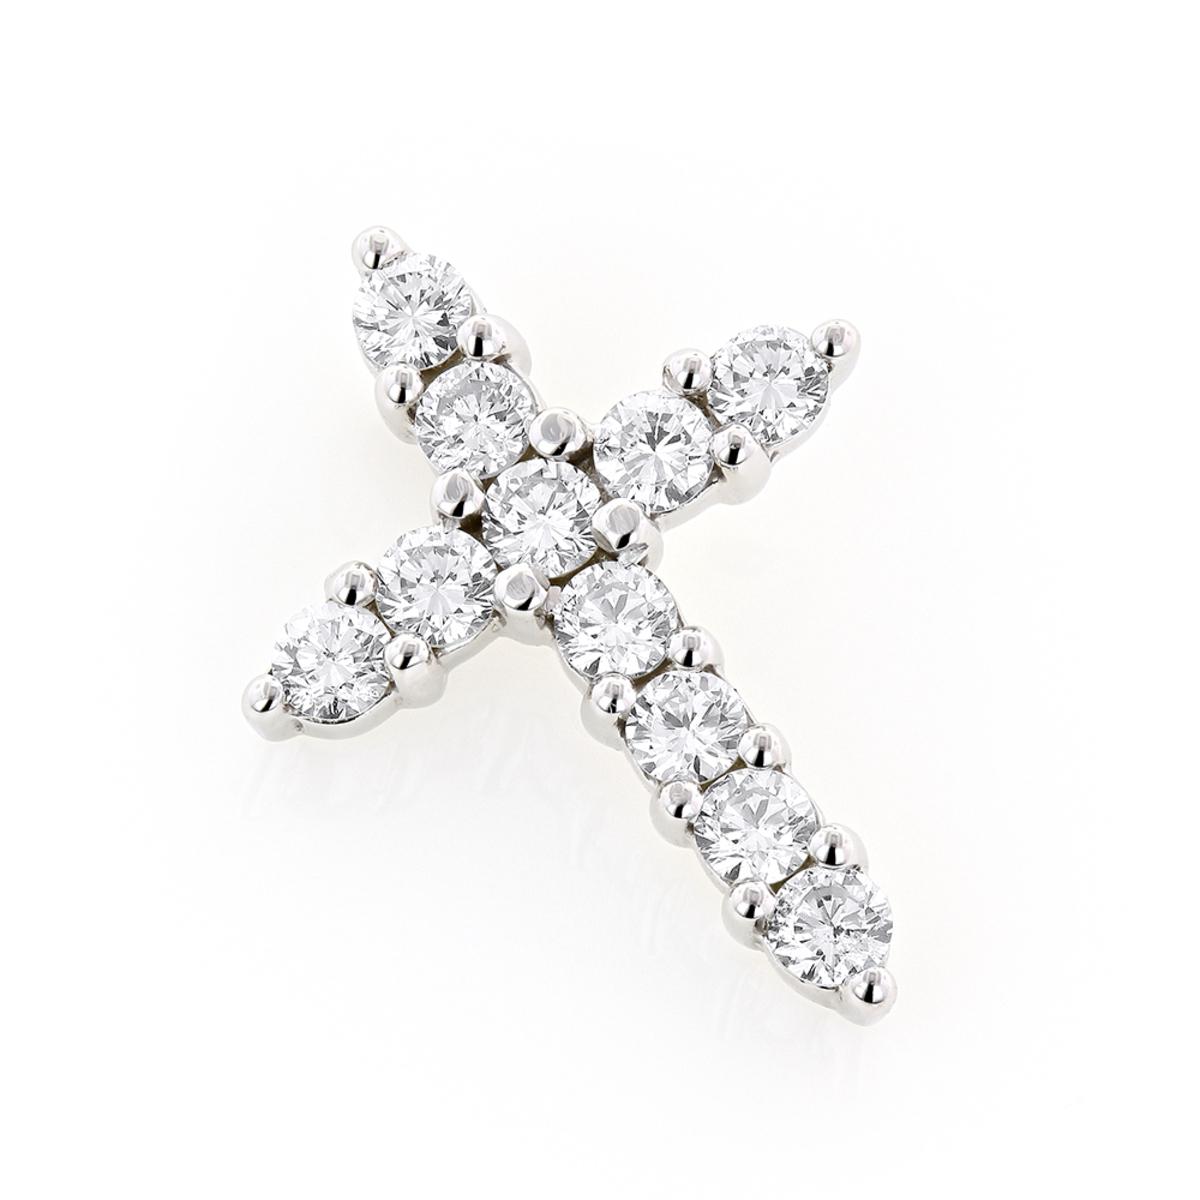 14K Gold Round Diamond Cross Pendant 1 carat